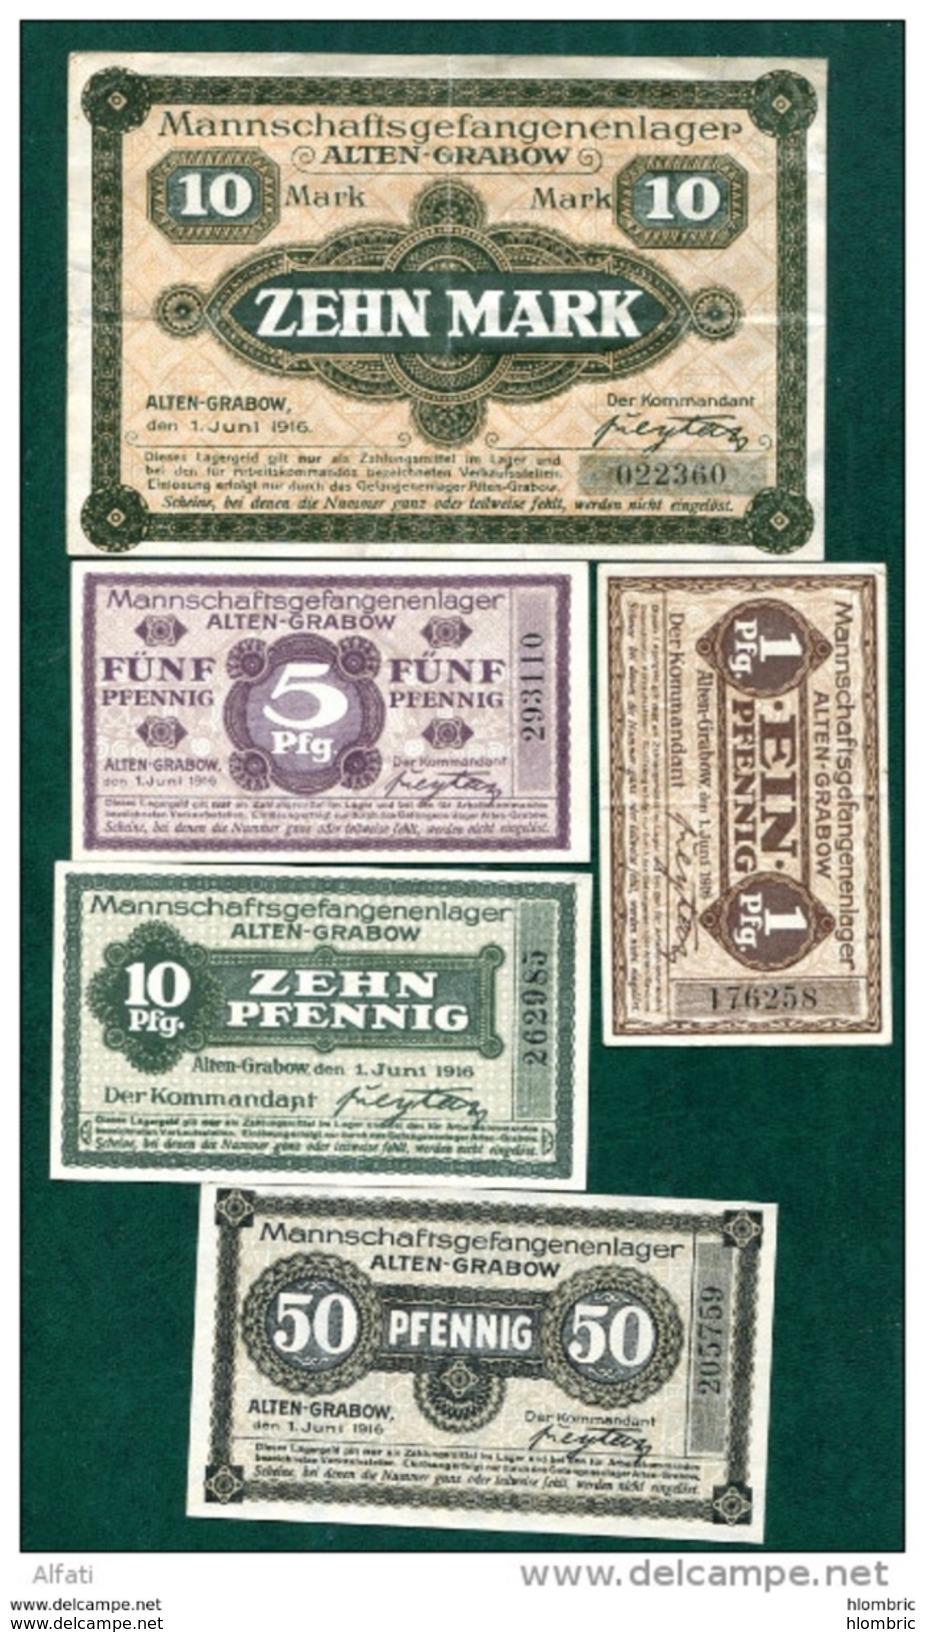 Alten  Grabow  10  Billets - Allemagne